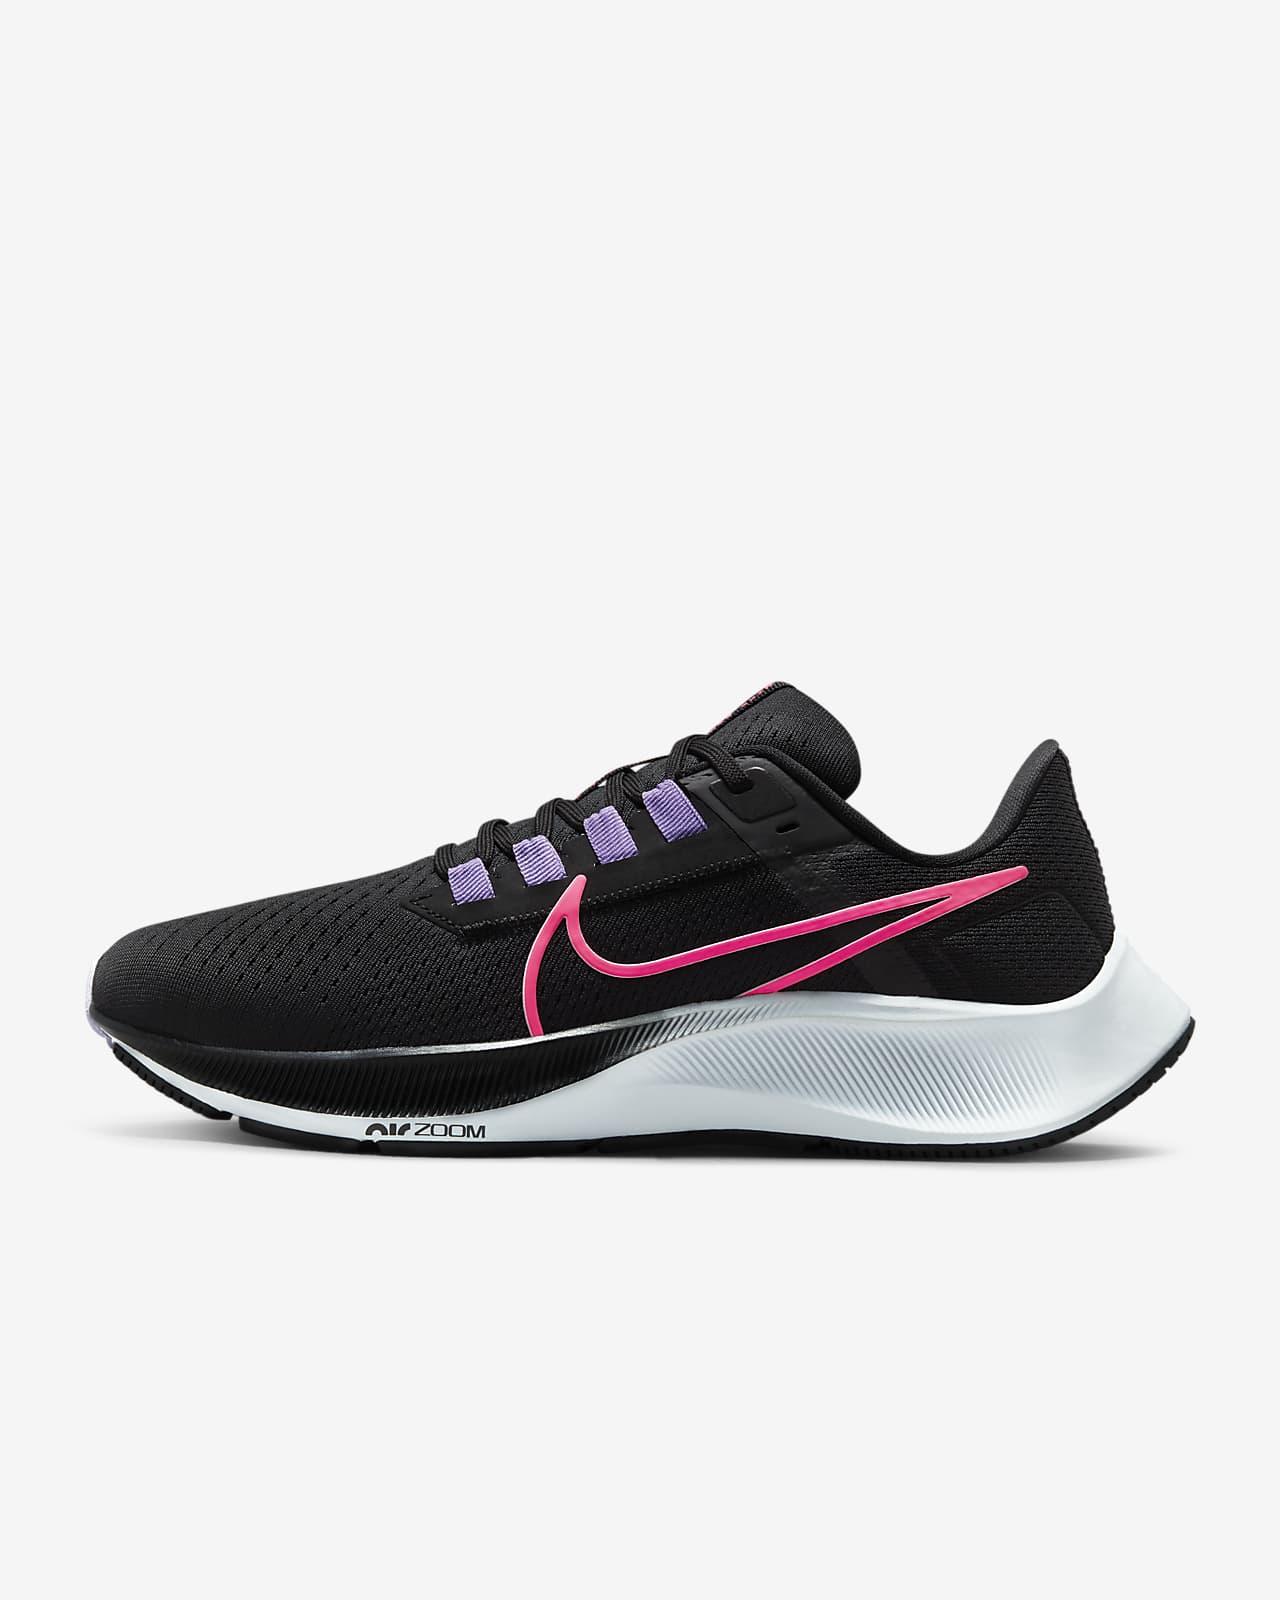 Nike Air Zoom Pegasus 38 Women's Road Running Shoes